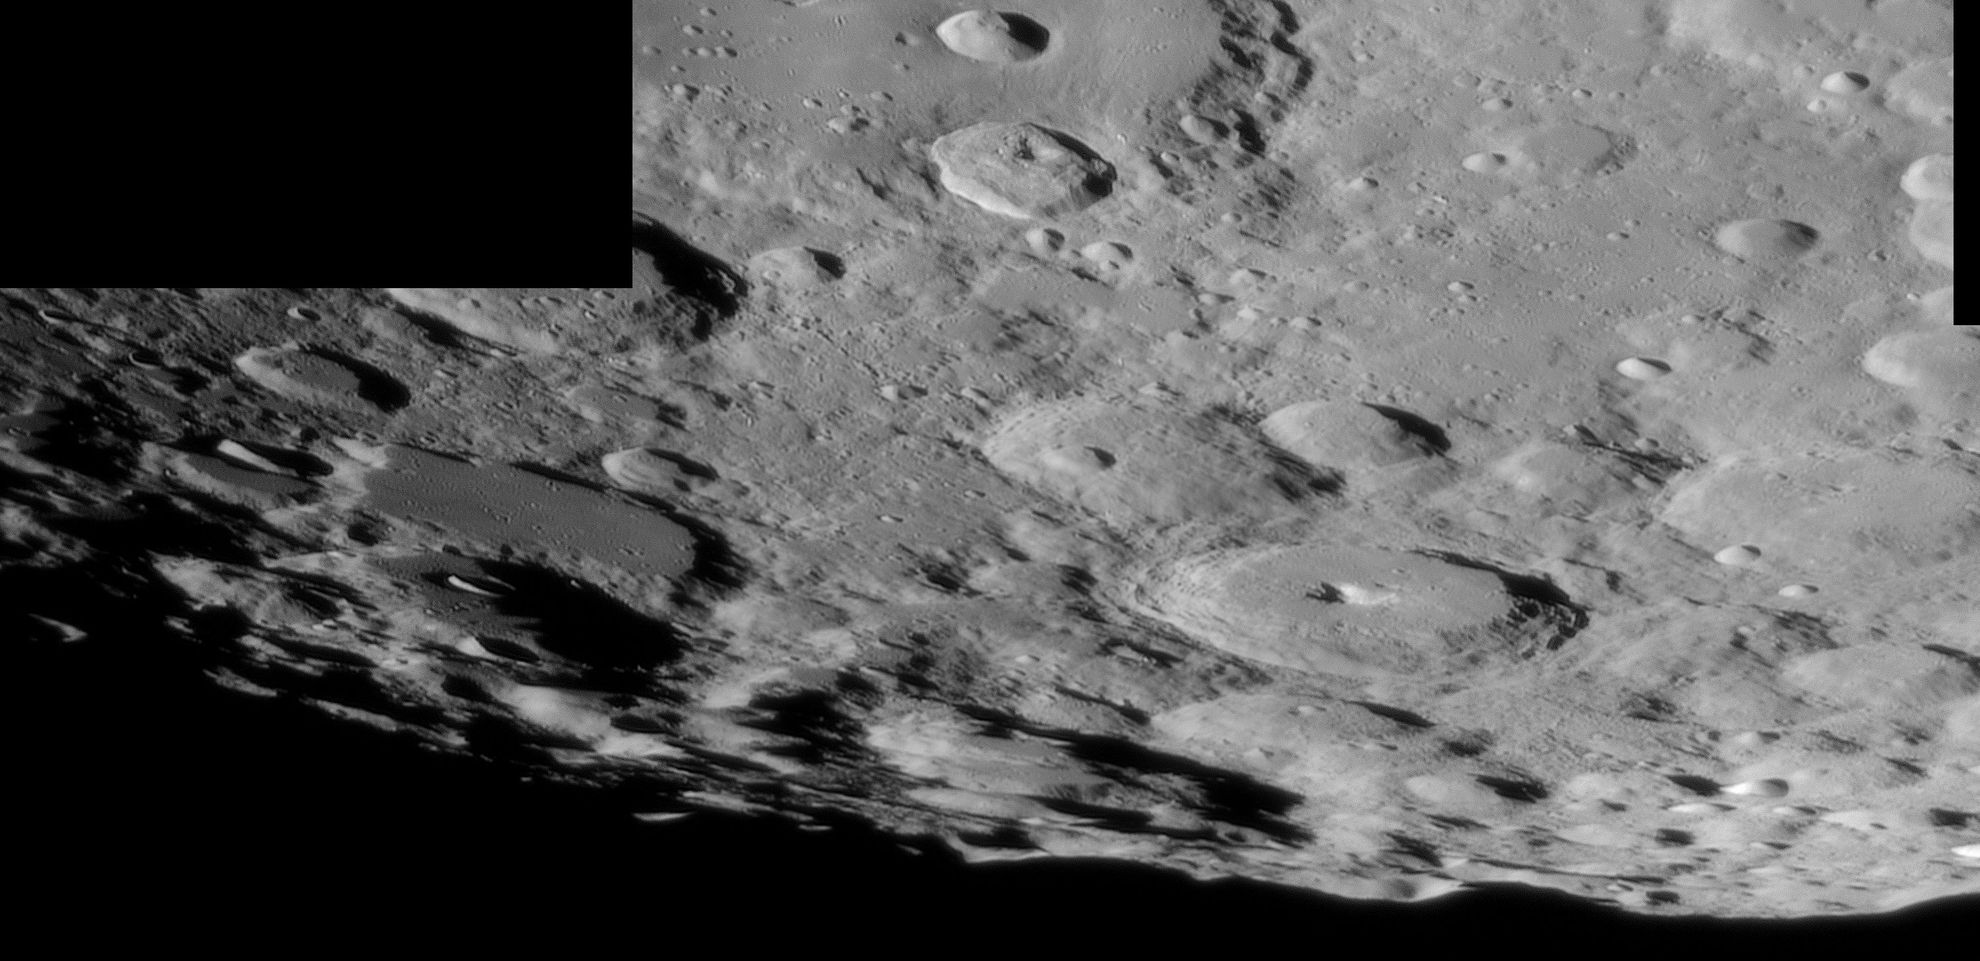 Moon_20190215_214319_23A_SouthPole.jpg